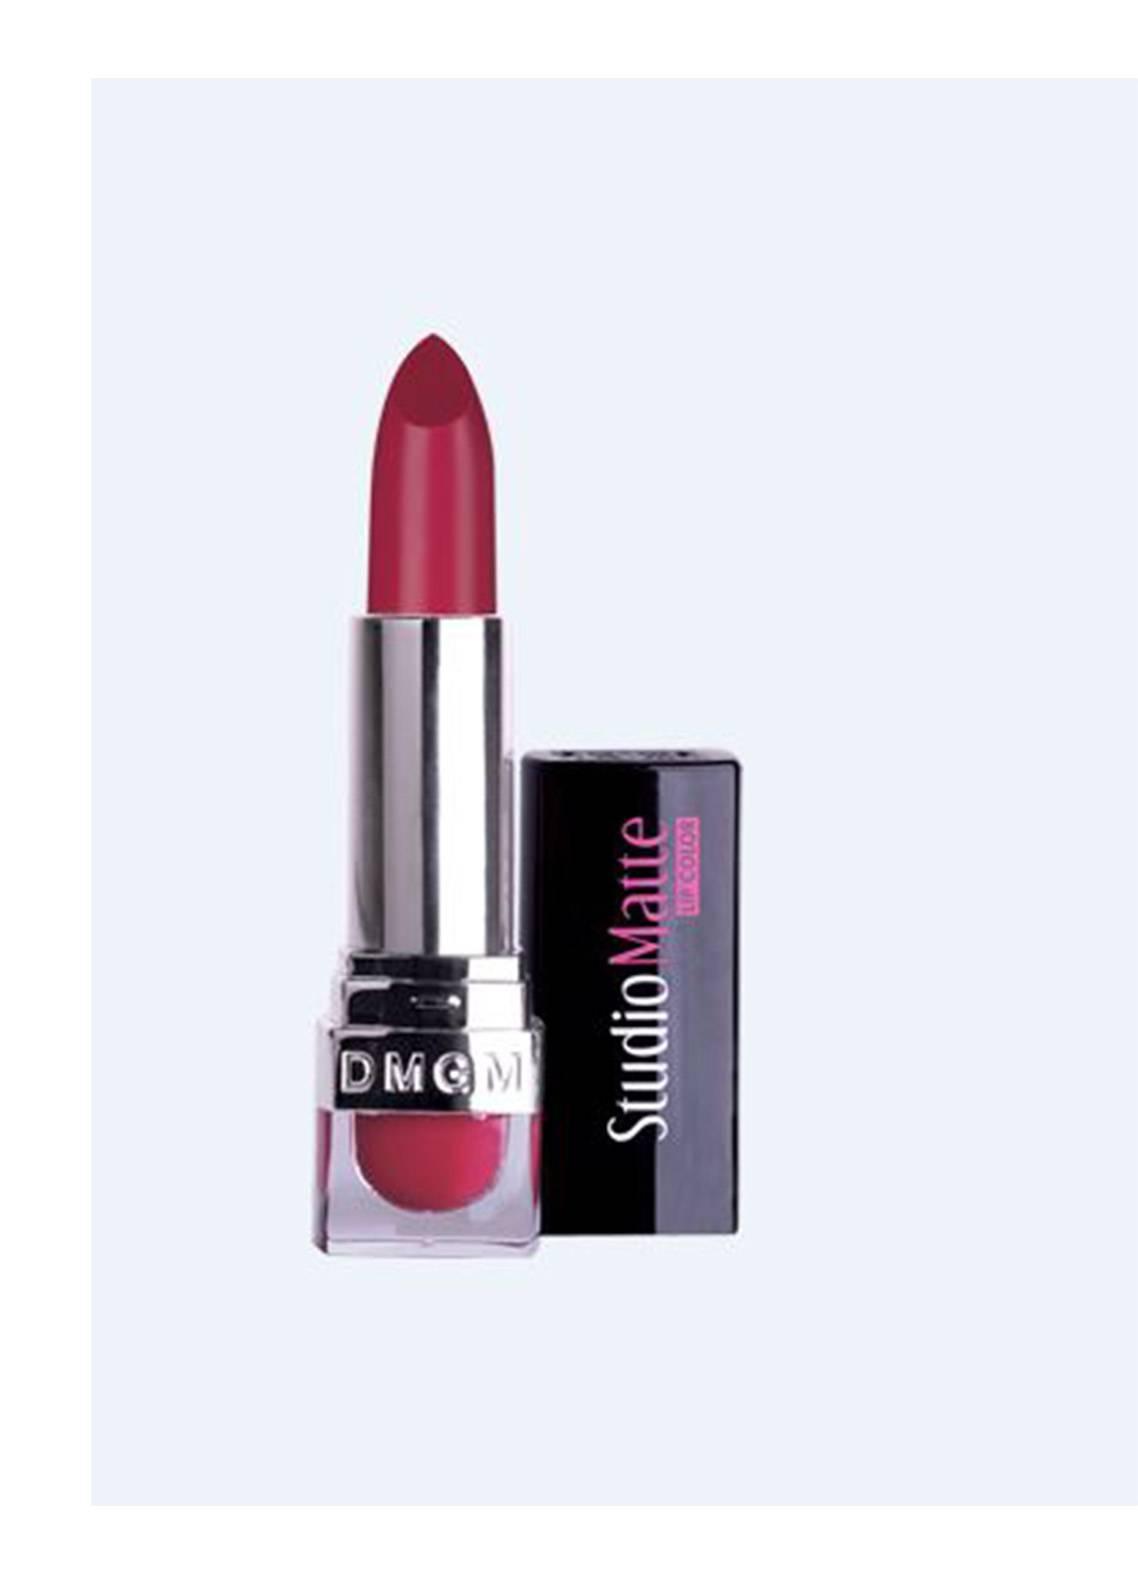 DMGM Studio Matte Lipstick - 506 - Mauve Obsession